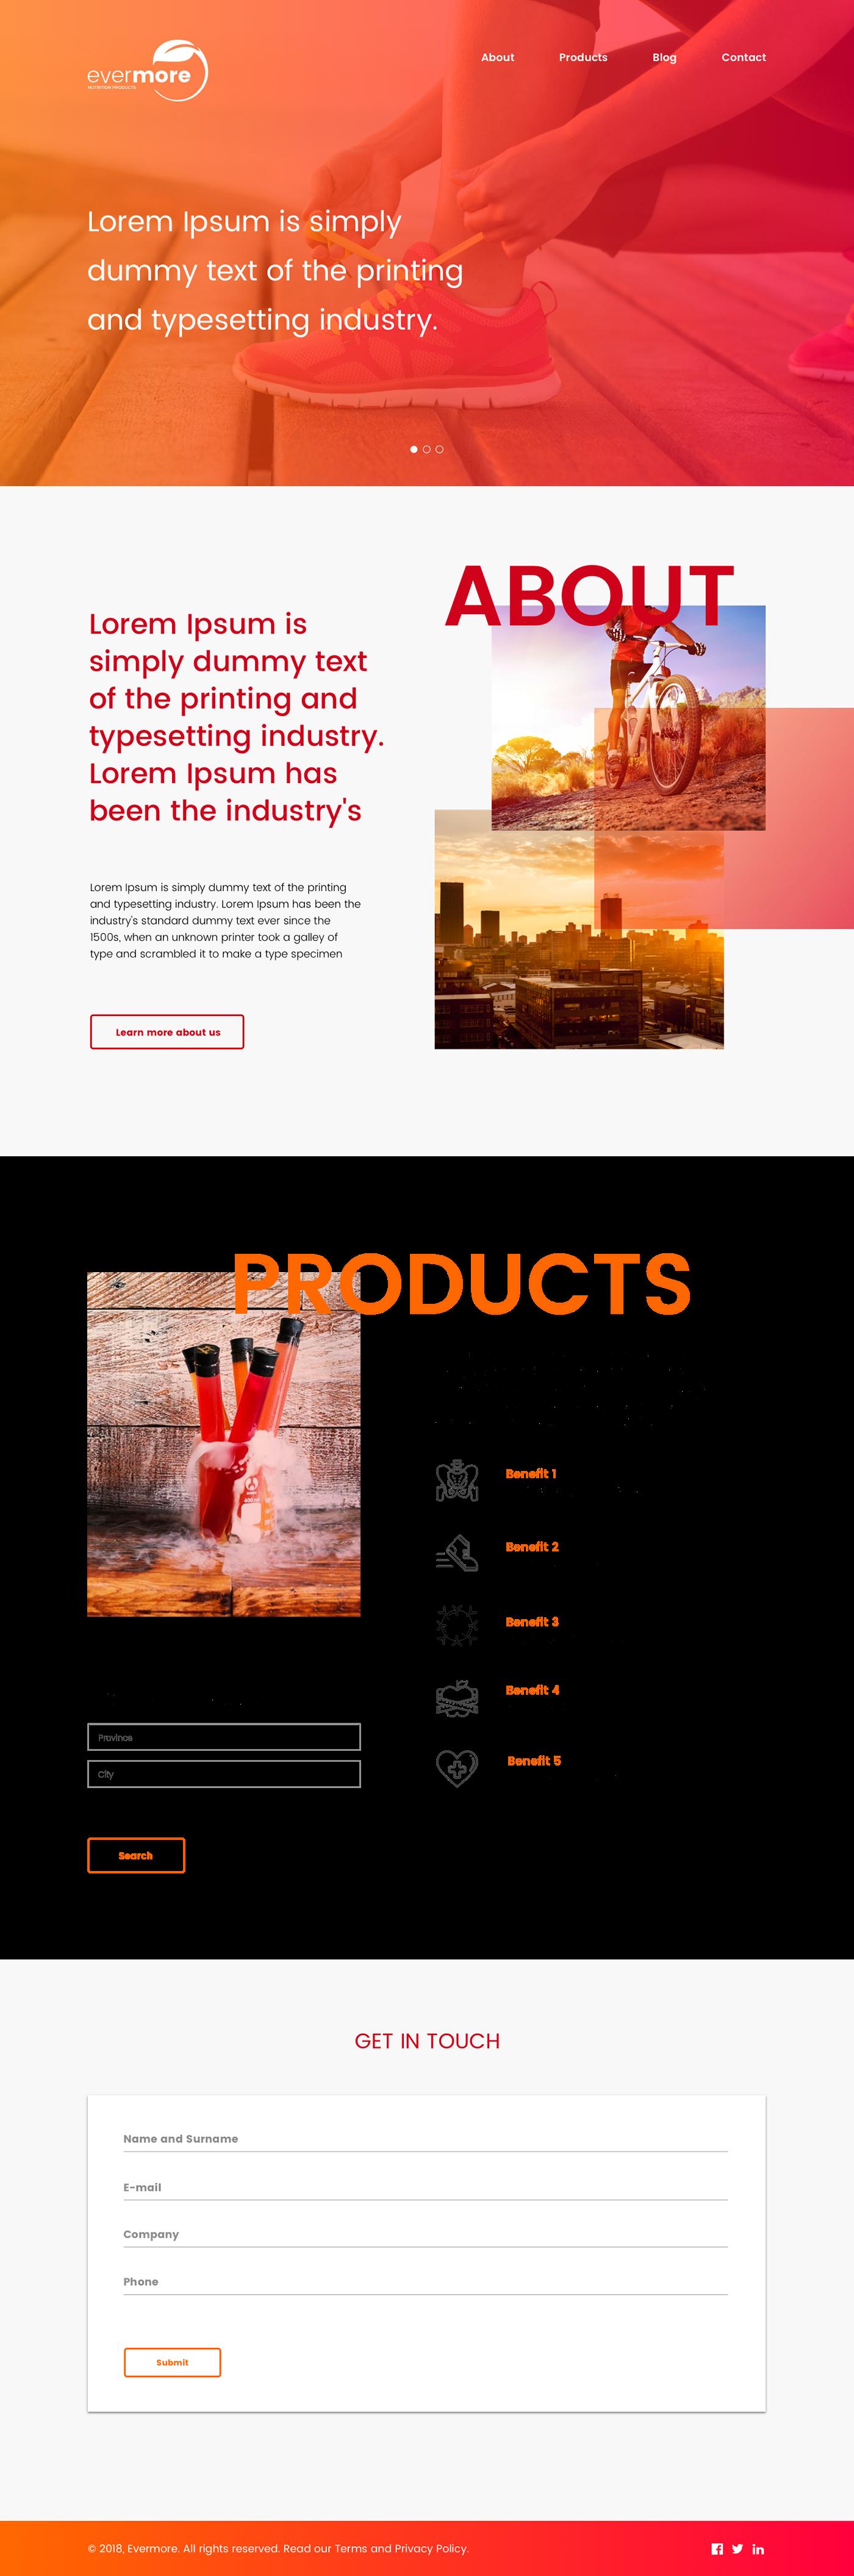 Web Design  ux UI nutrition website Health nutrition brand health brand graphic design  Website Design